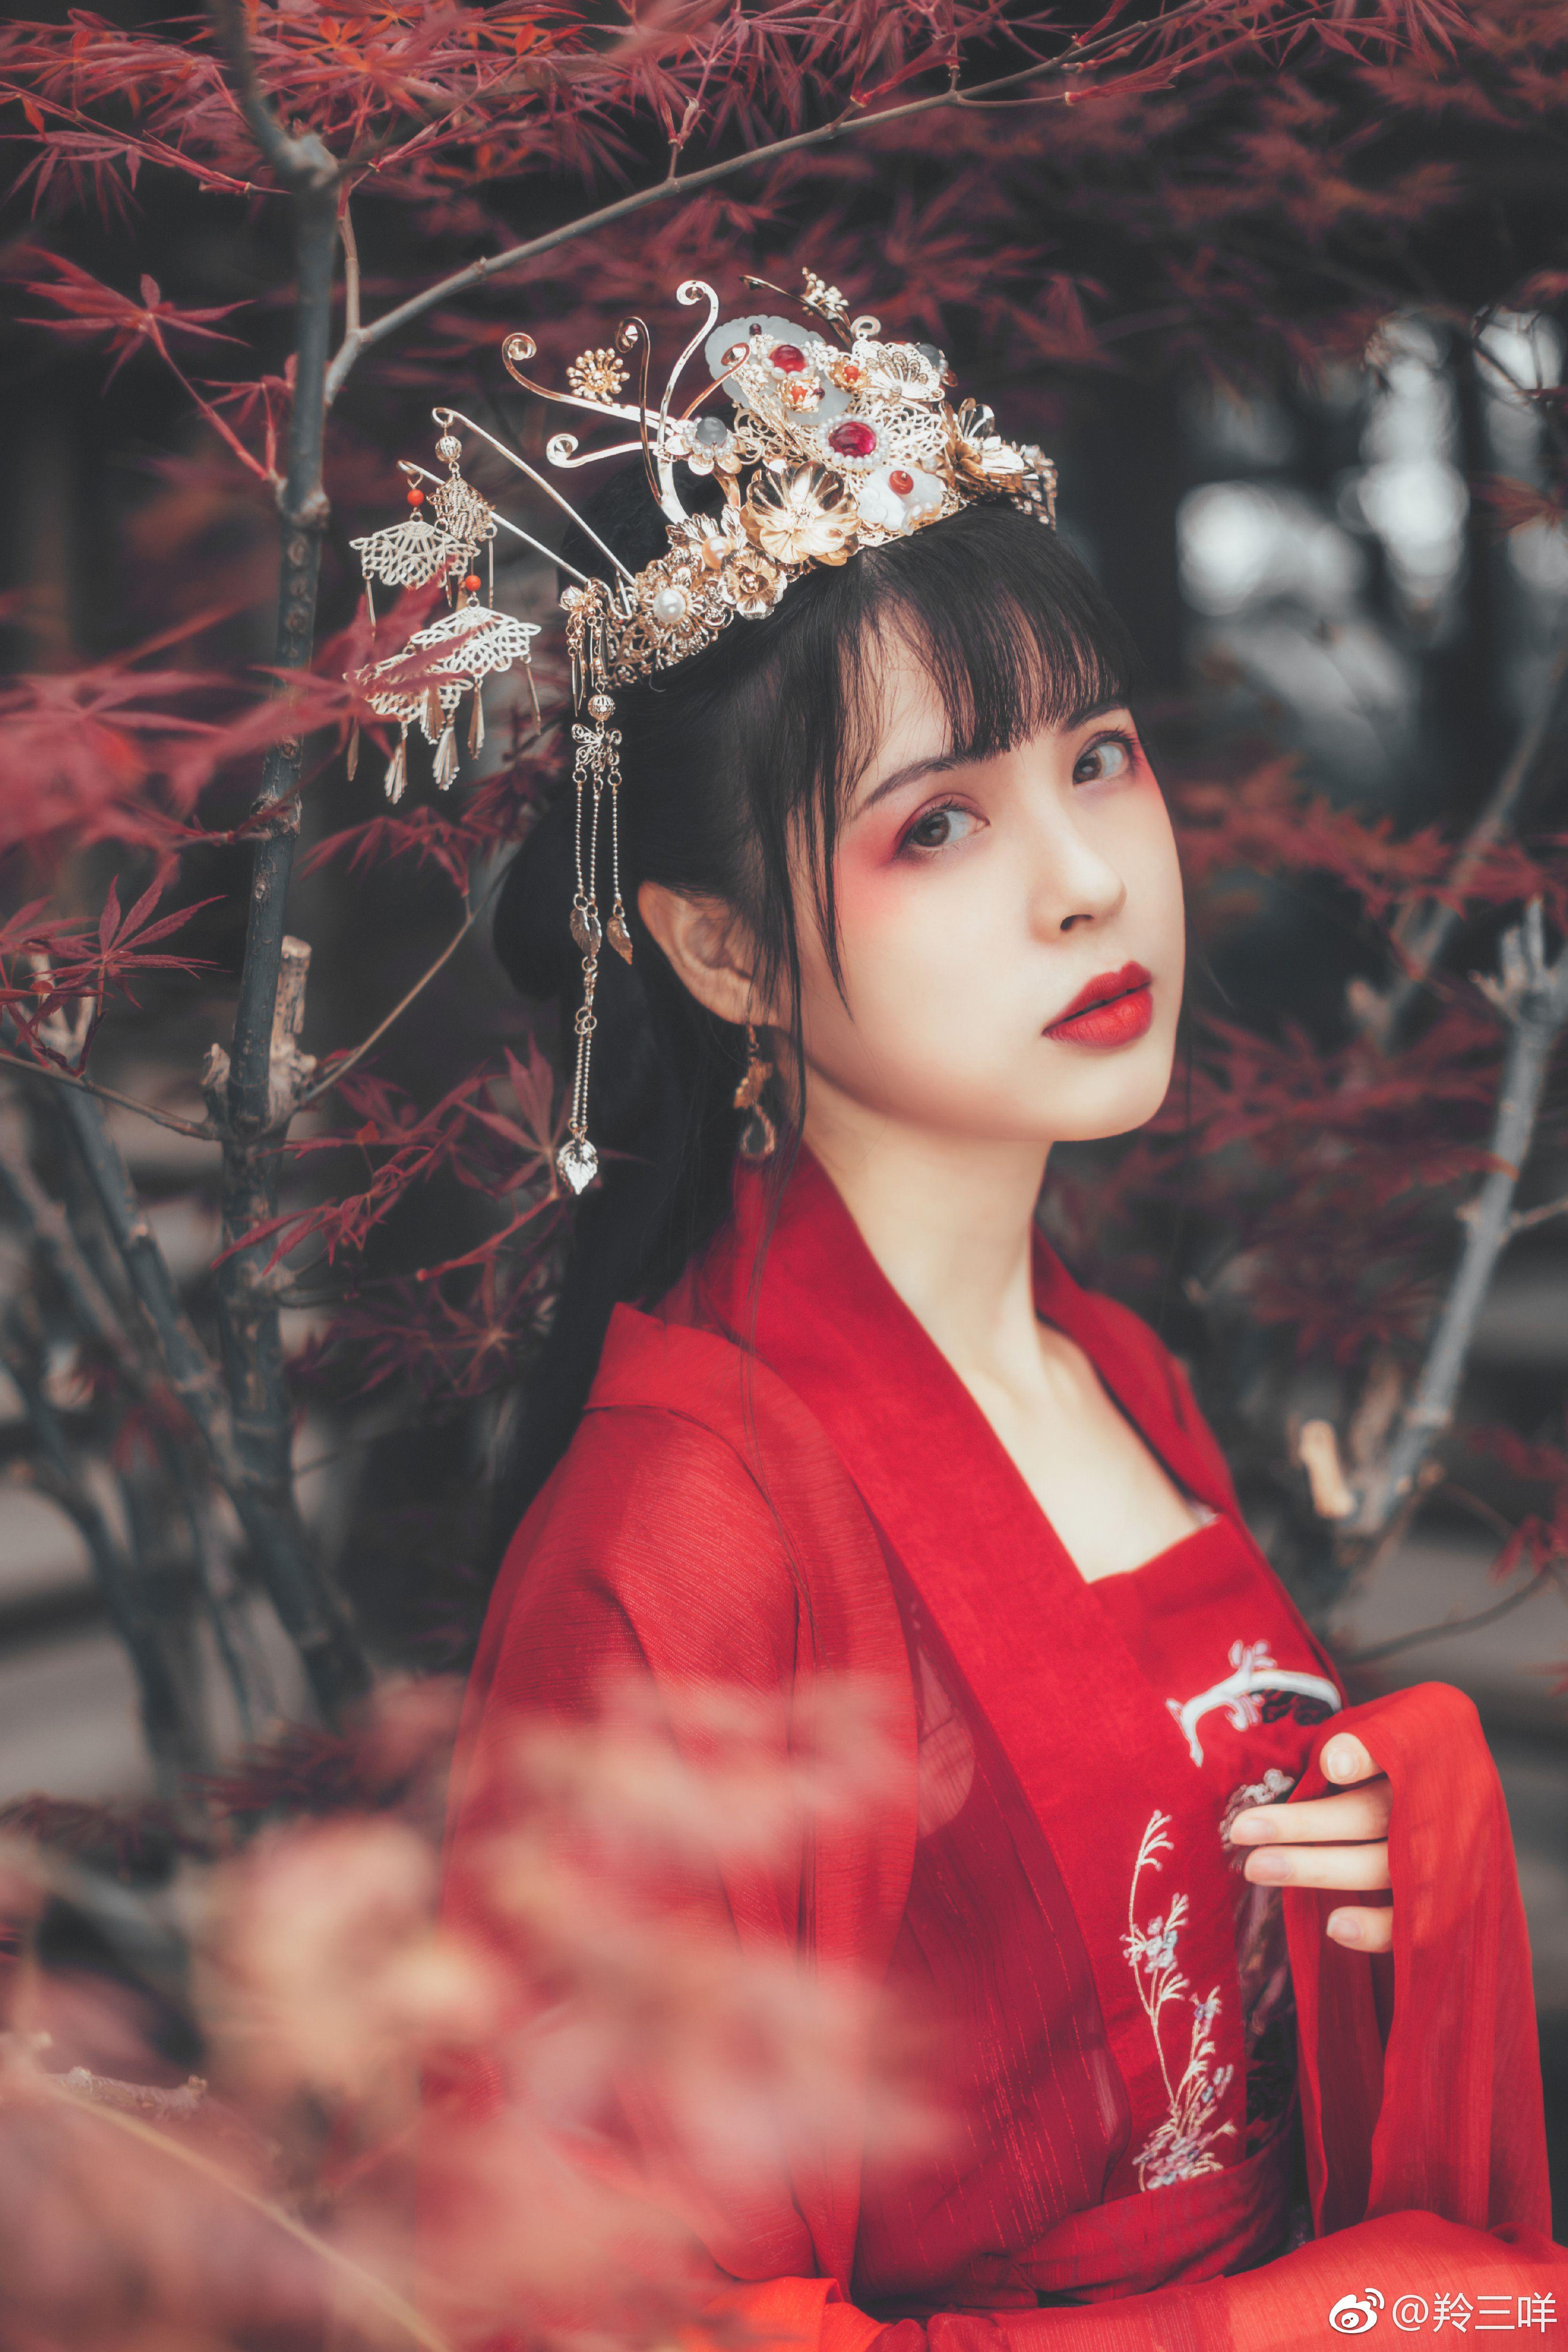 Follow me satan👑 㚢王 Cô dâu, Nữ thần, Con gái